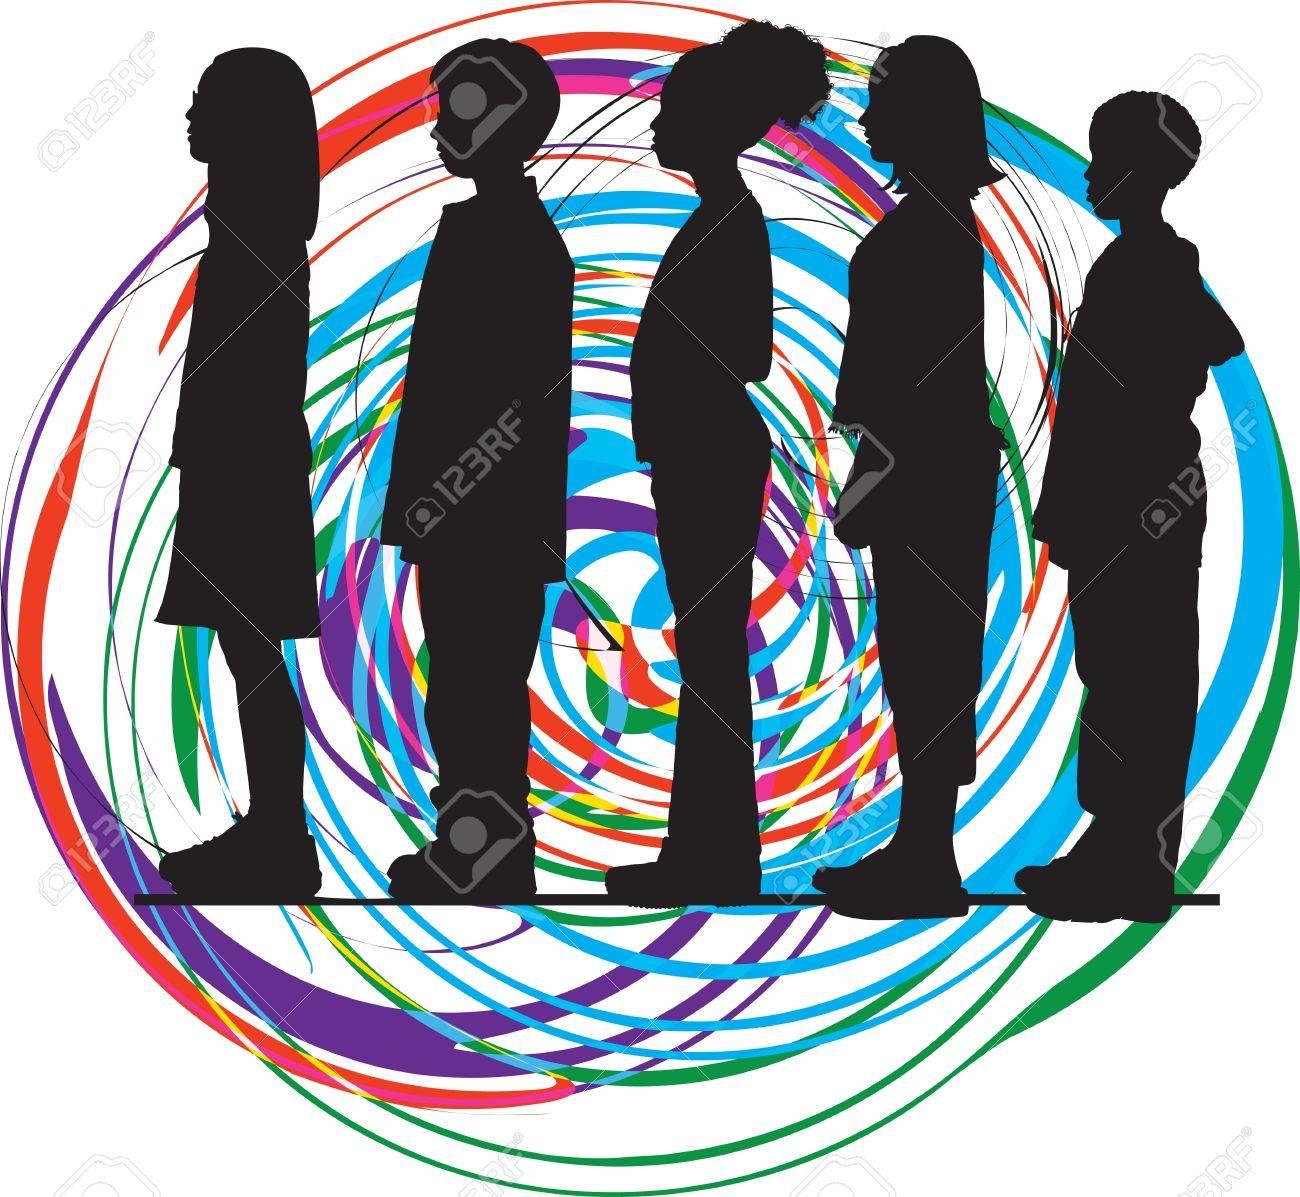 Friends. Editable Vector Illustration Stock Vector - 10999280